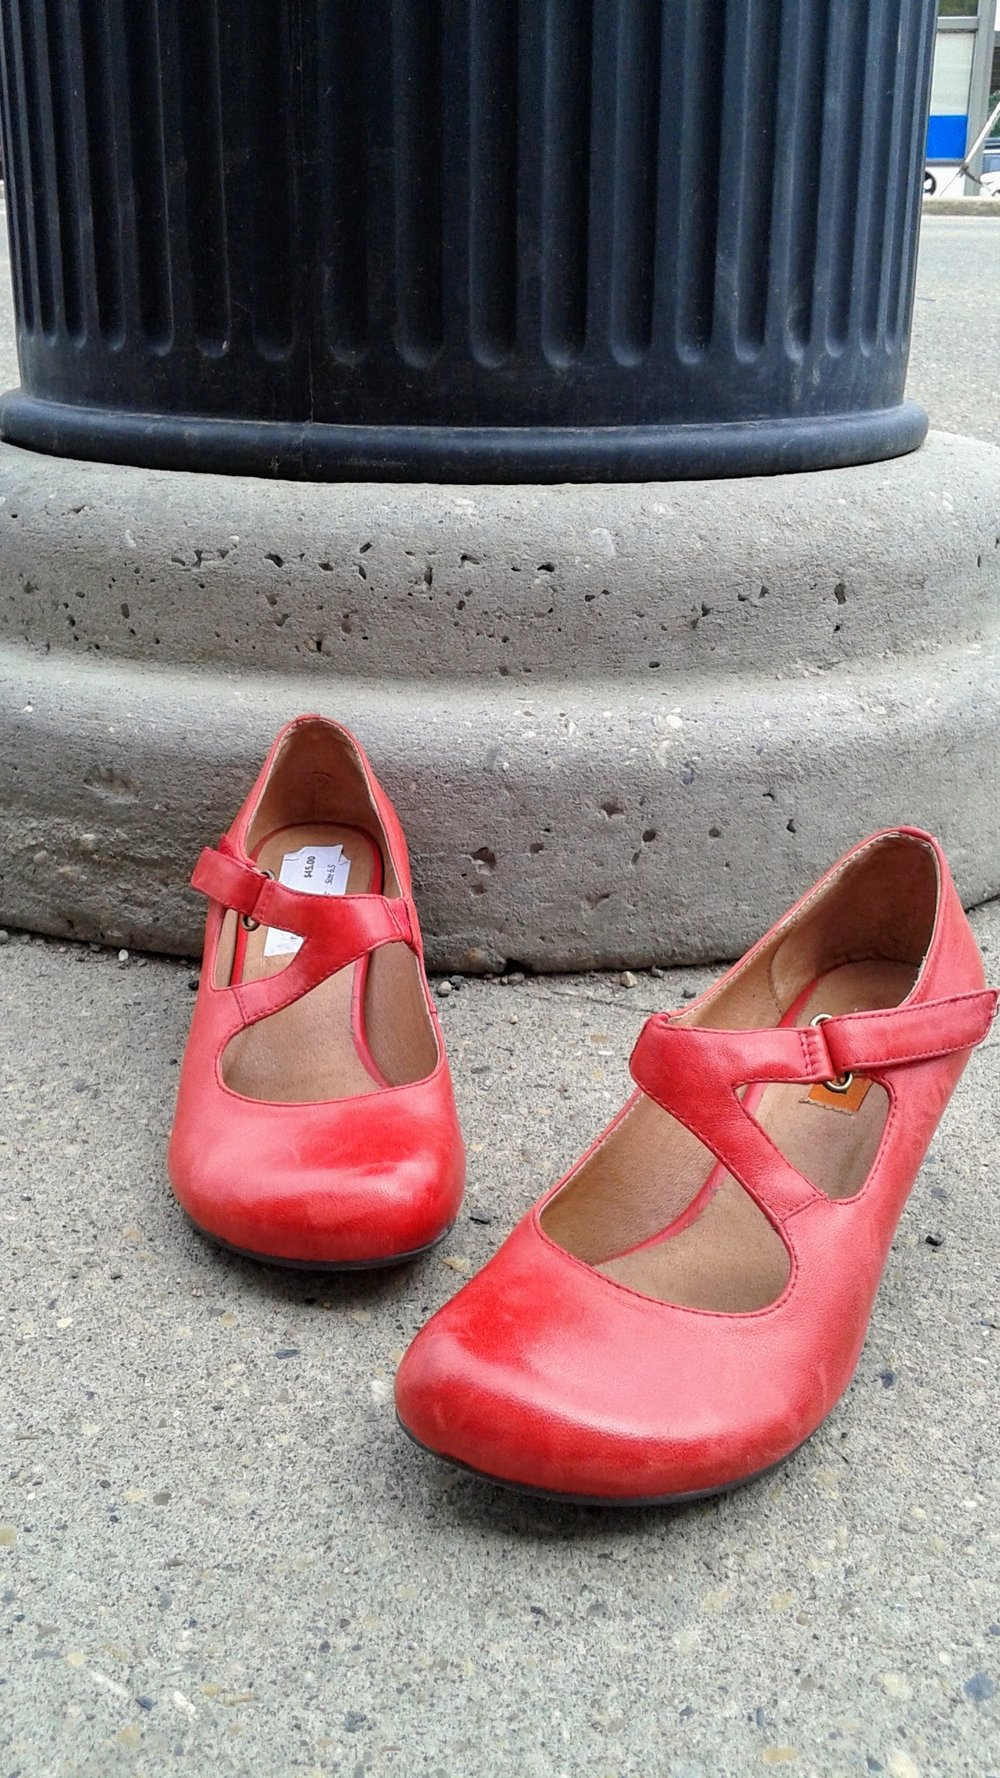 Miz Mooz shoes; S6.5, $45